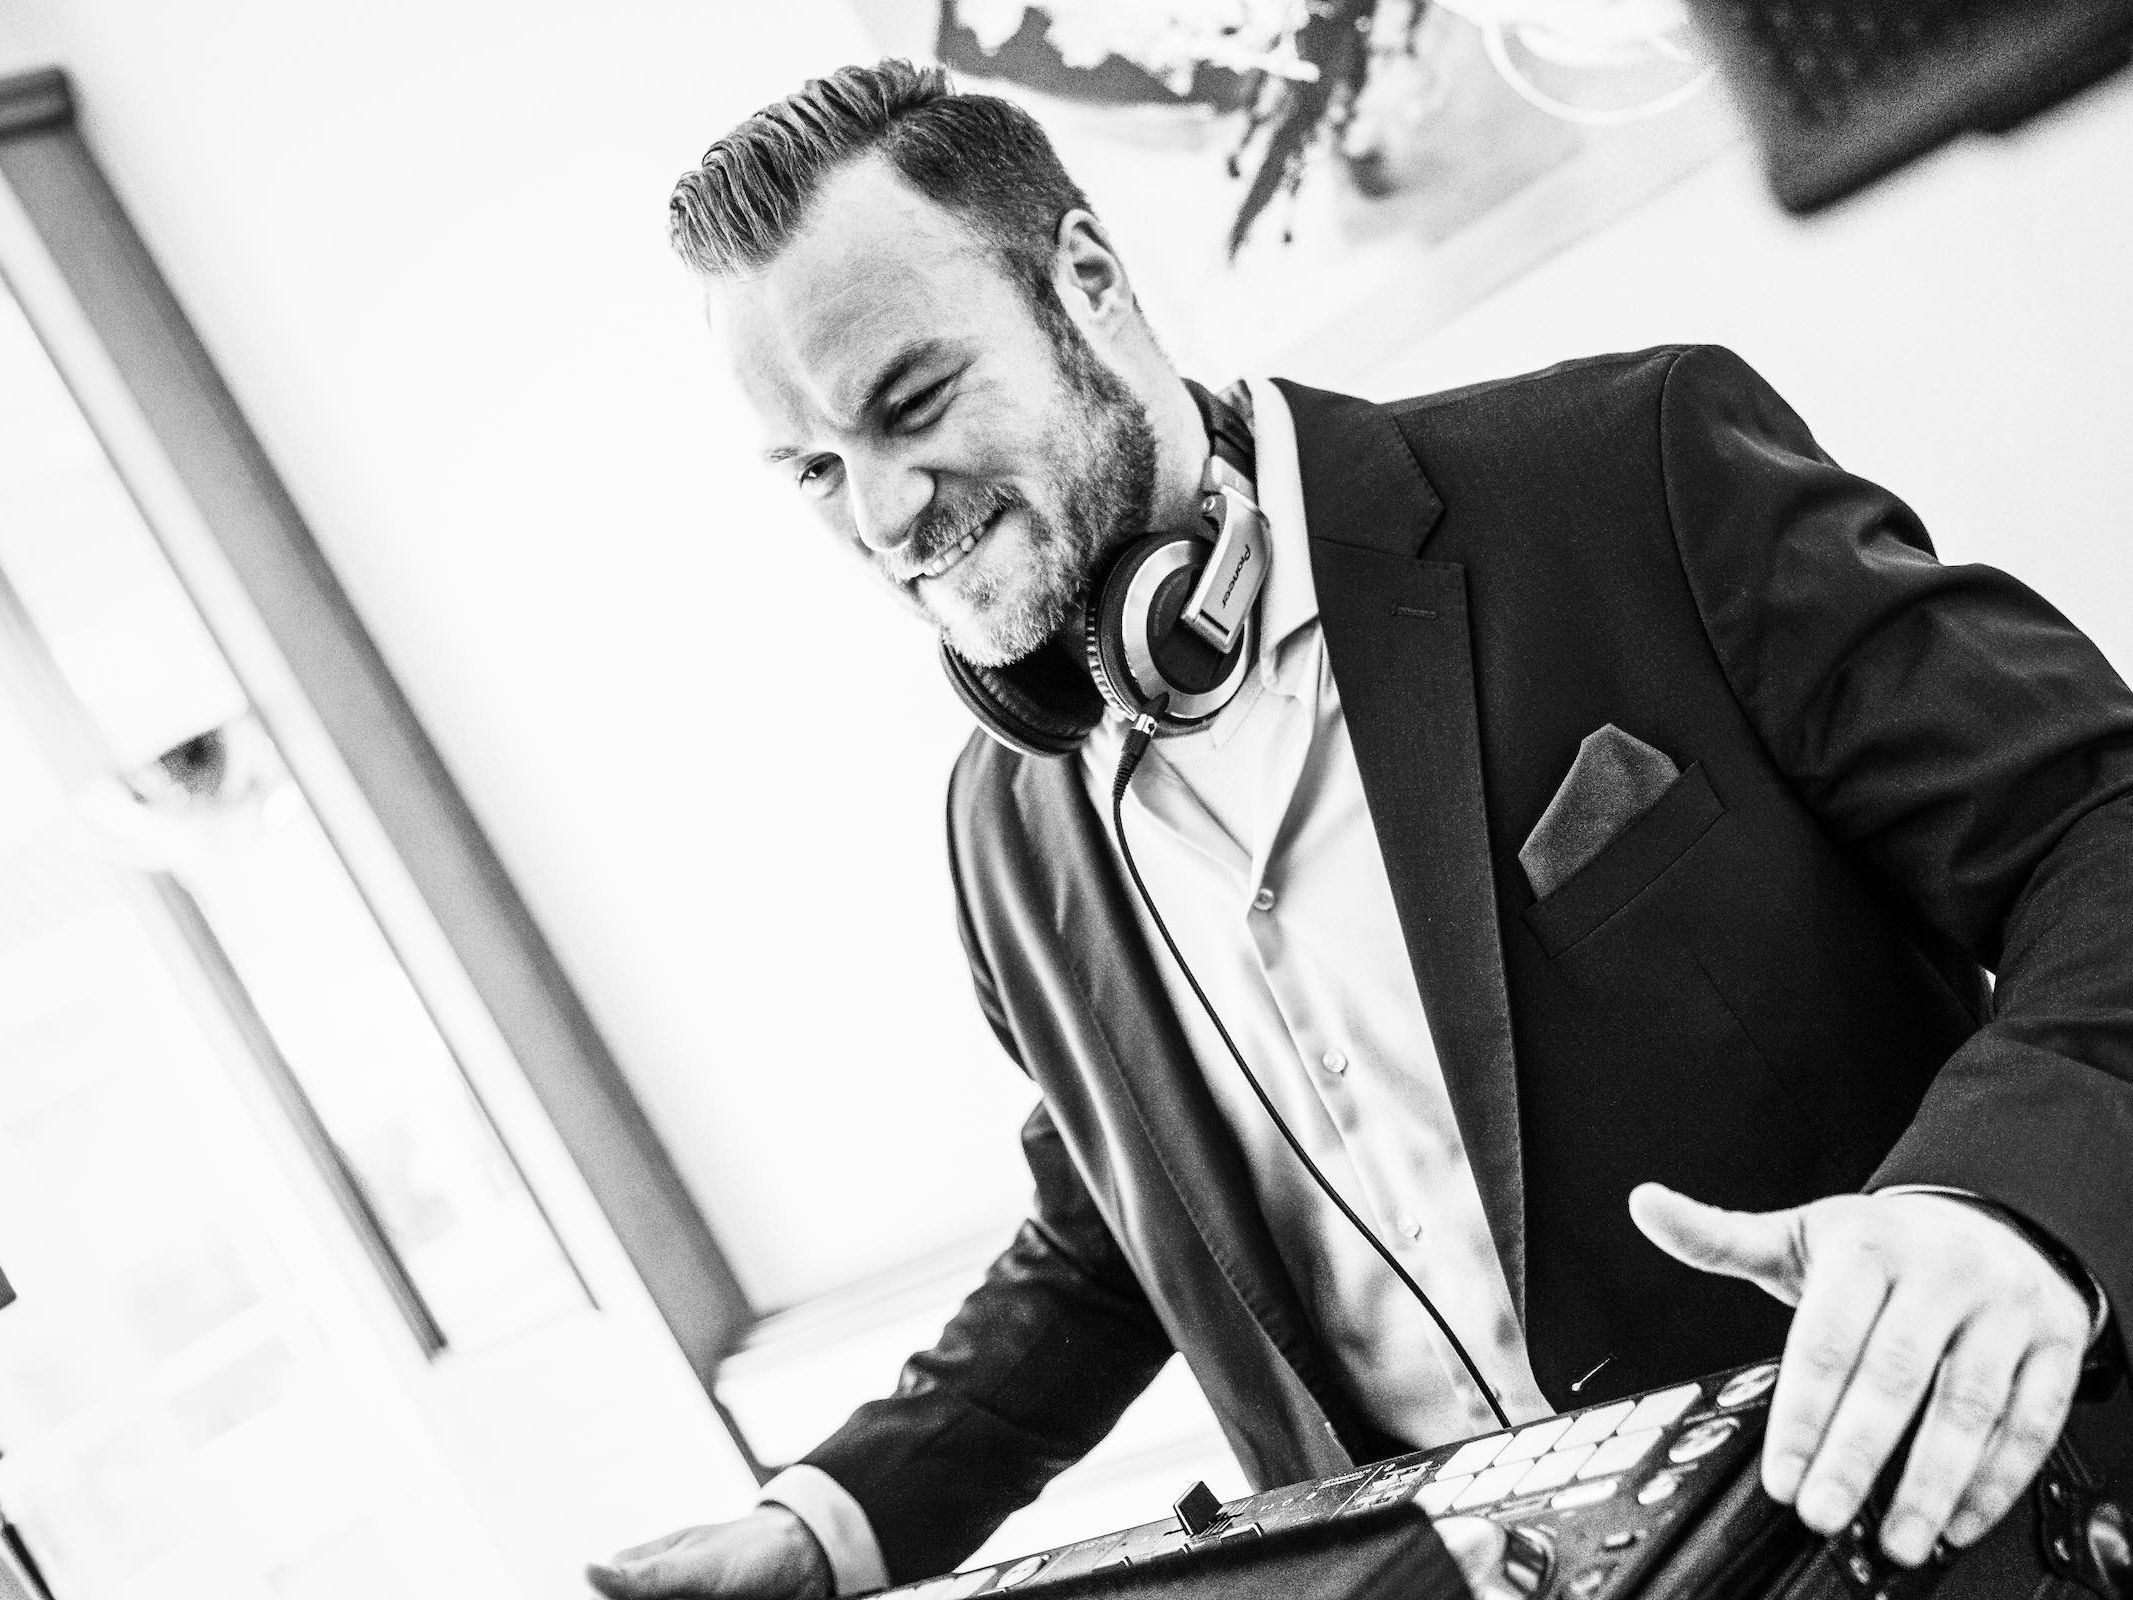 DJ | Hannover | Buchen | Discjockey | Nils | Remme | DJ | Firmenfeier | Messe | DJ | Event | DJ | Geburtstag | DJ | Service | DJ | Kosten | DJ | Mieten | DJ | Anfragen | DJ | Agentur | Lehmann | Eventservice